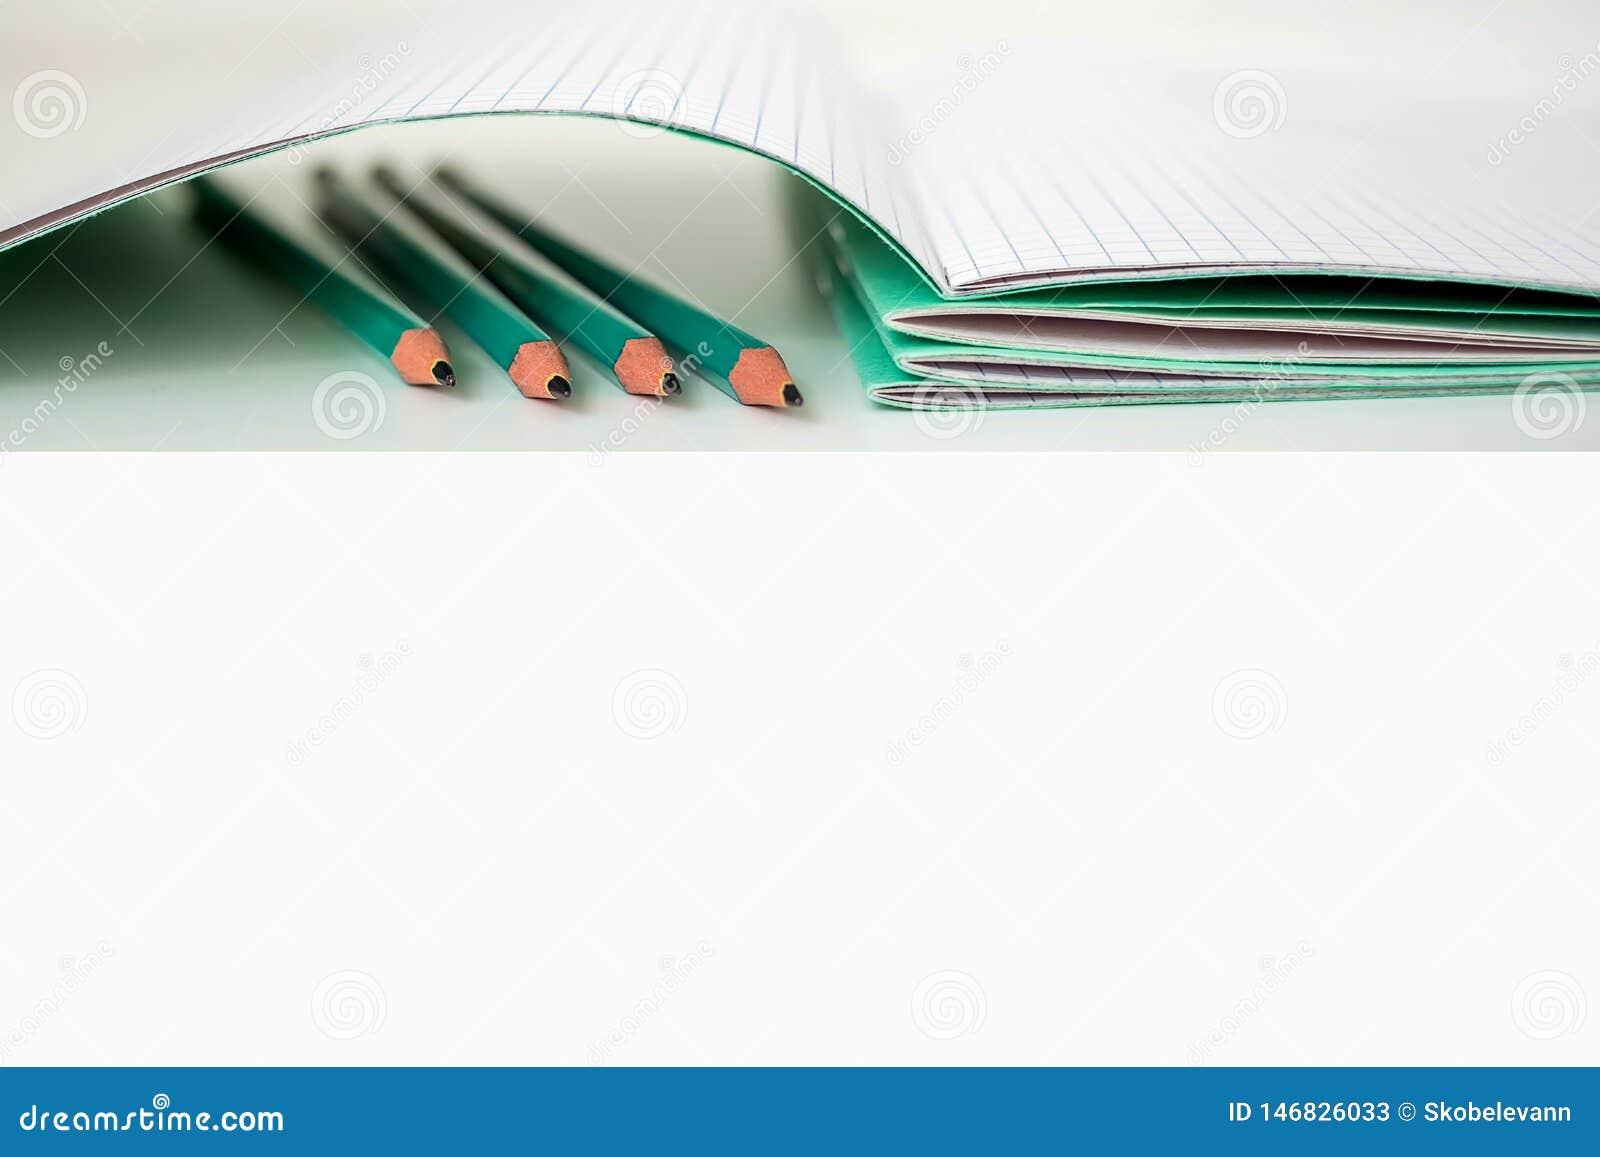 Pencils next to the school notebook